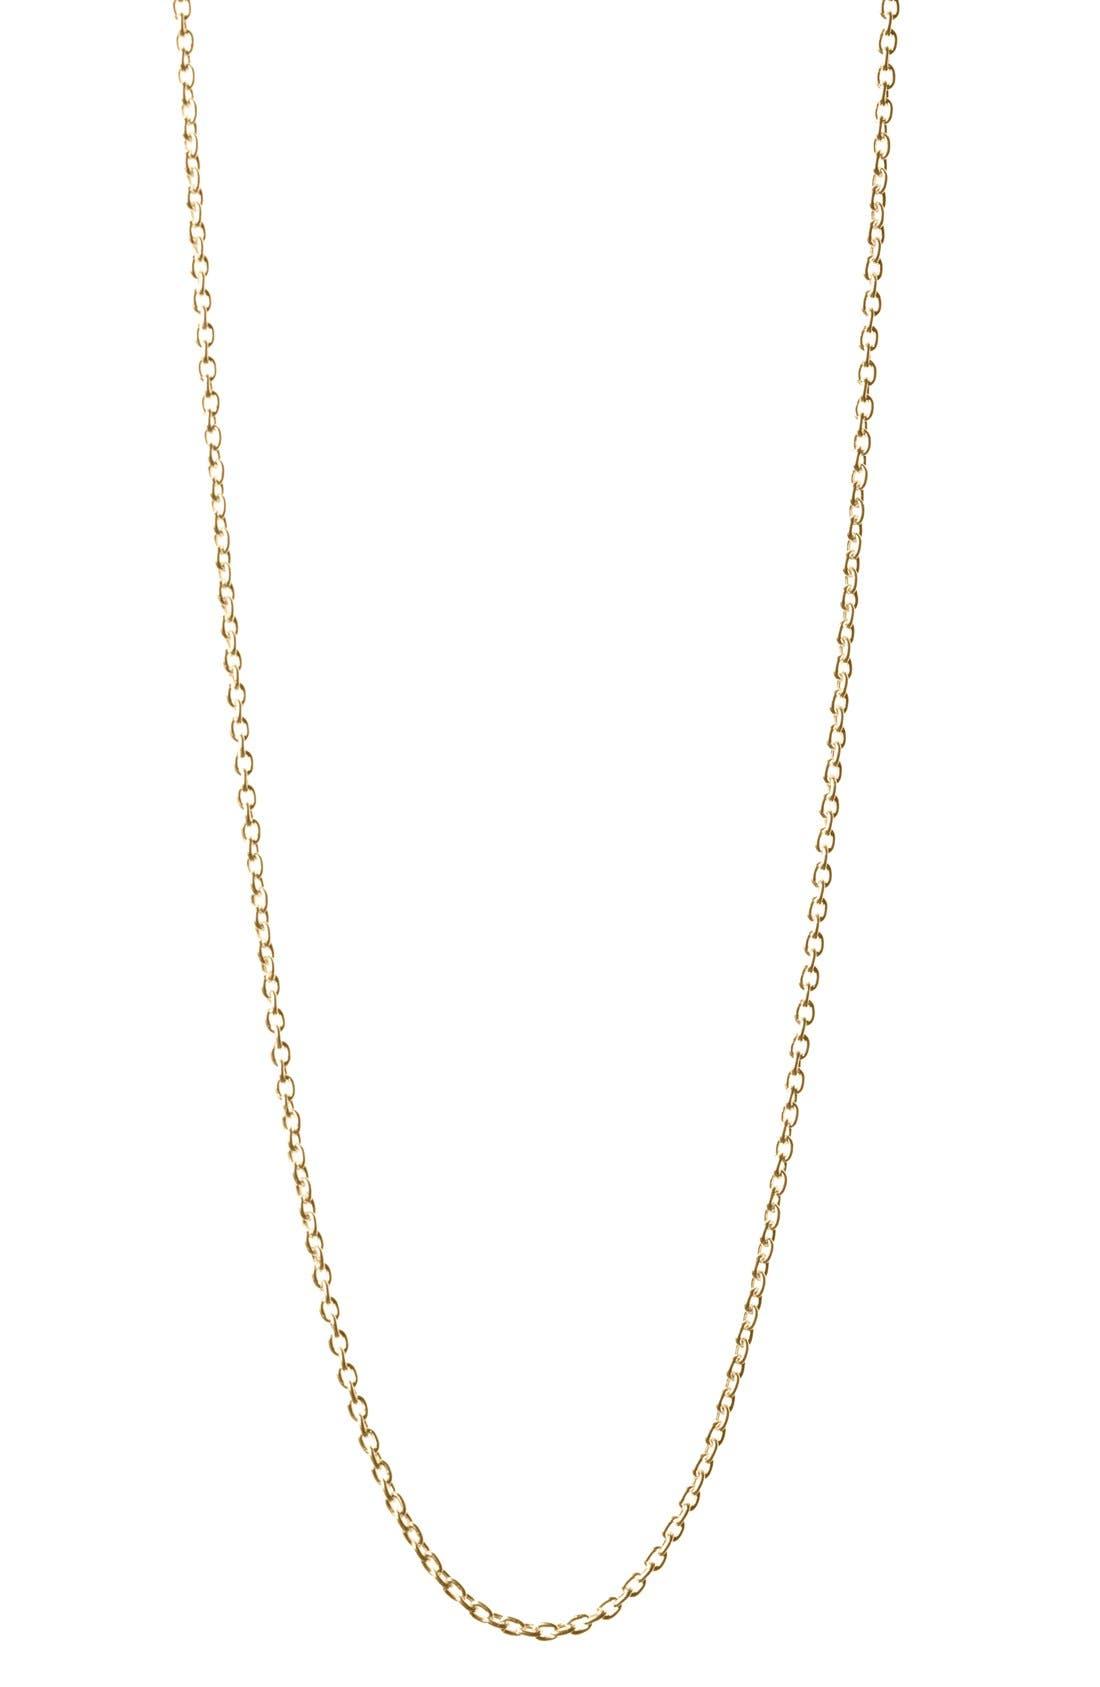 Alternate Image 1 Selected - Baroni Long Link Necklace